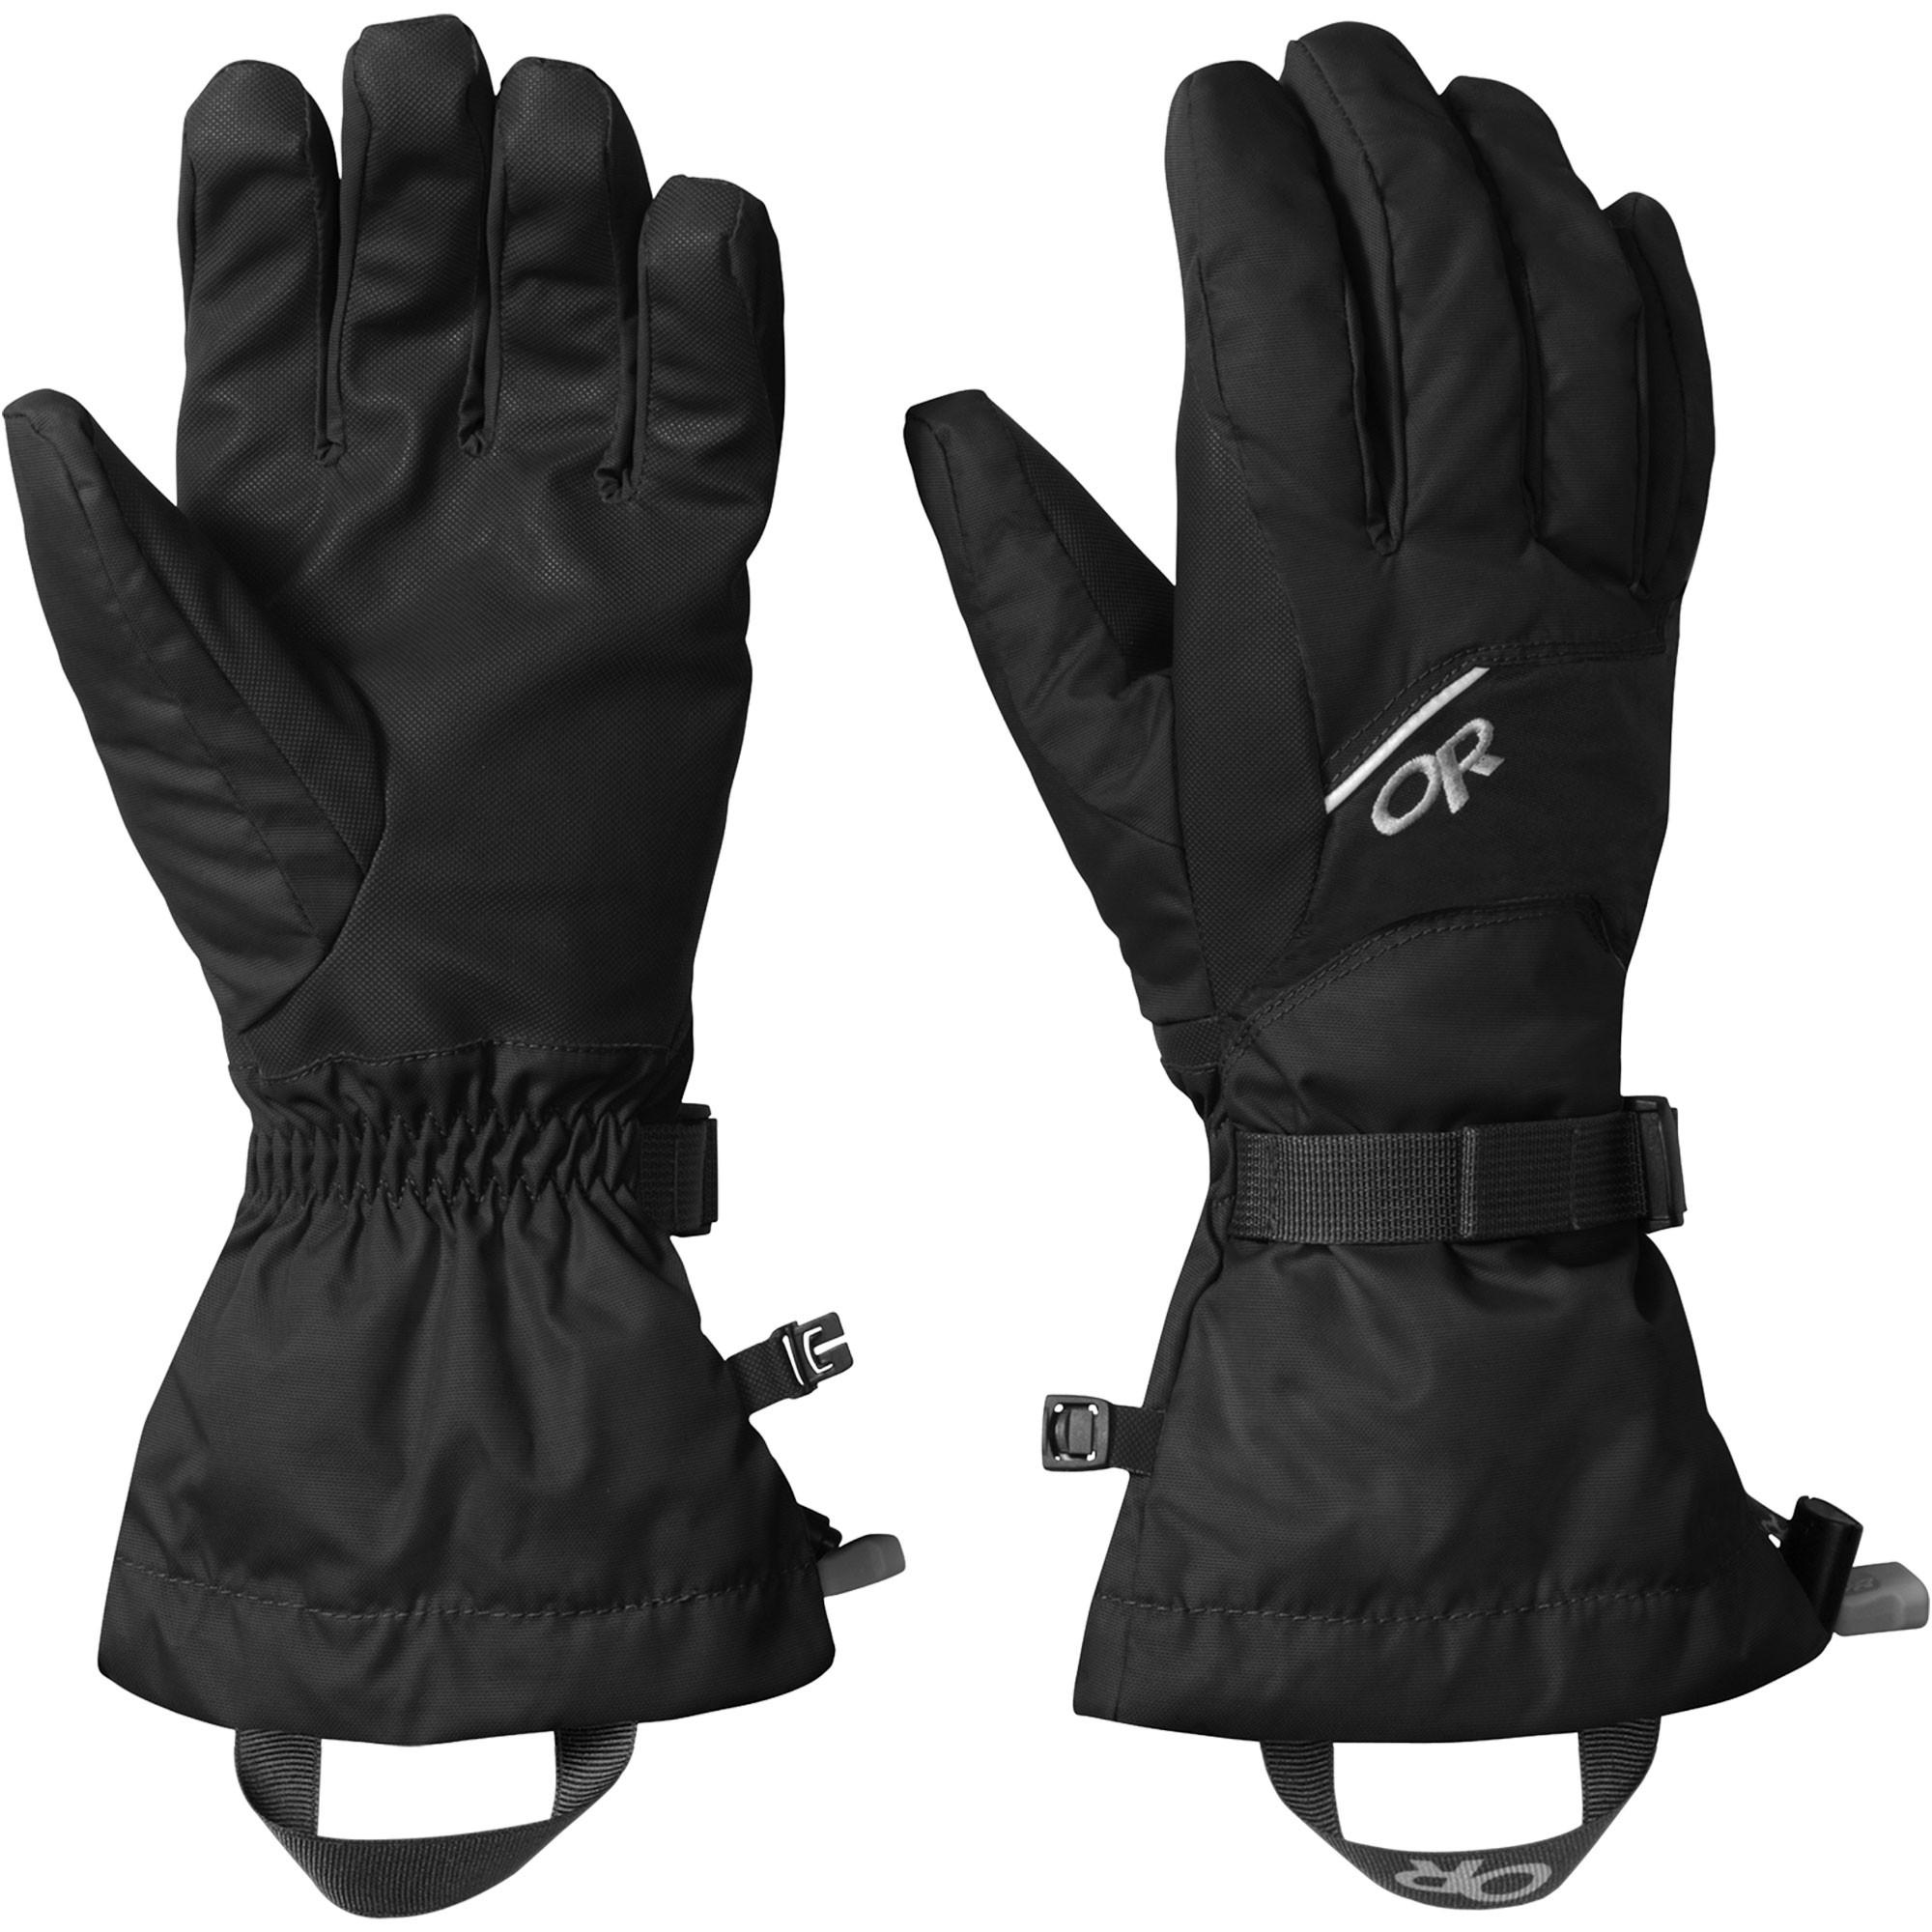 Outdoor-Research-Adrenaline-Glove-Mens-Black-W17.